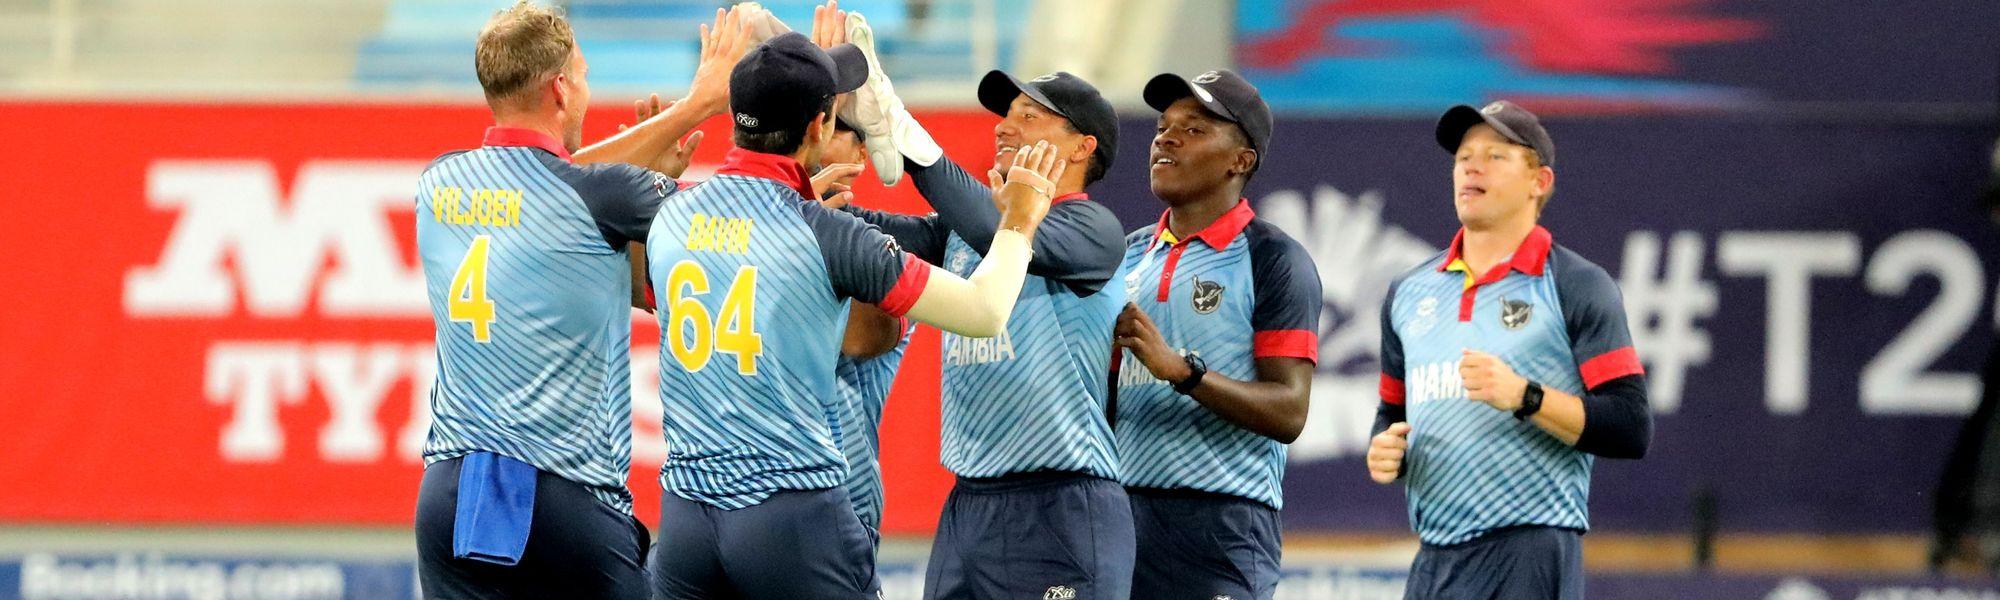 Namibia celebrate wicket of Assadollah Vala